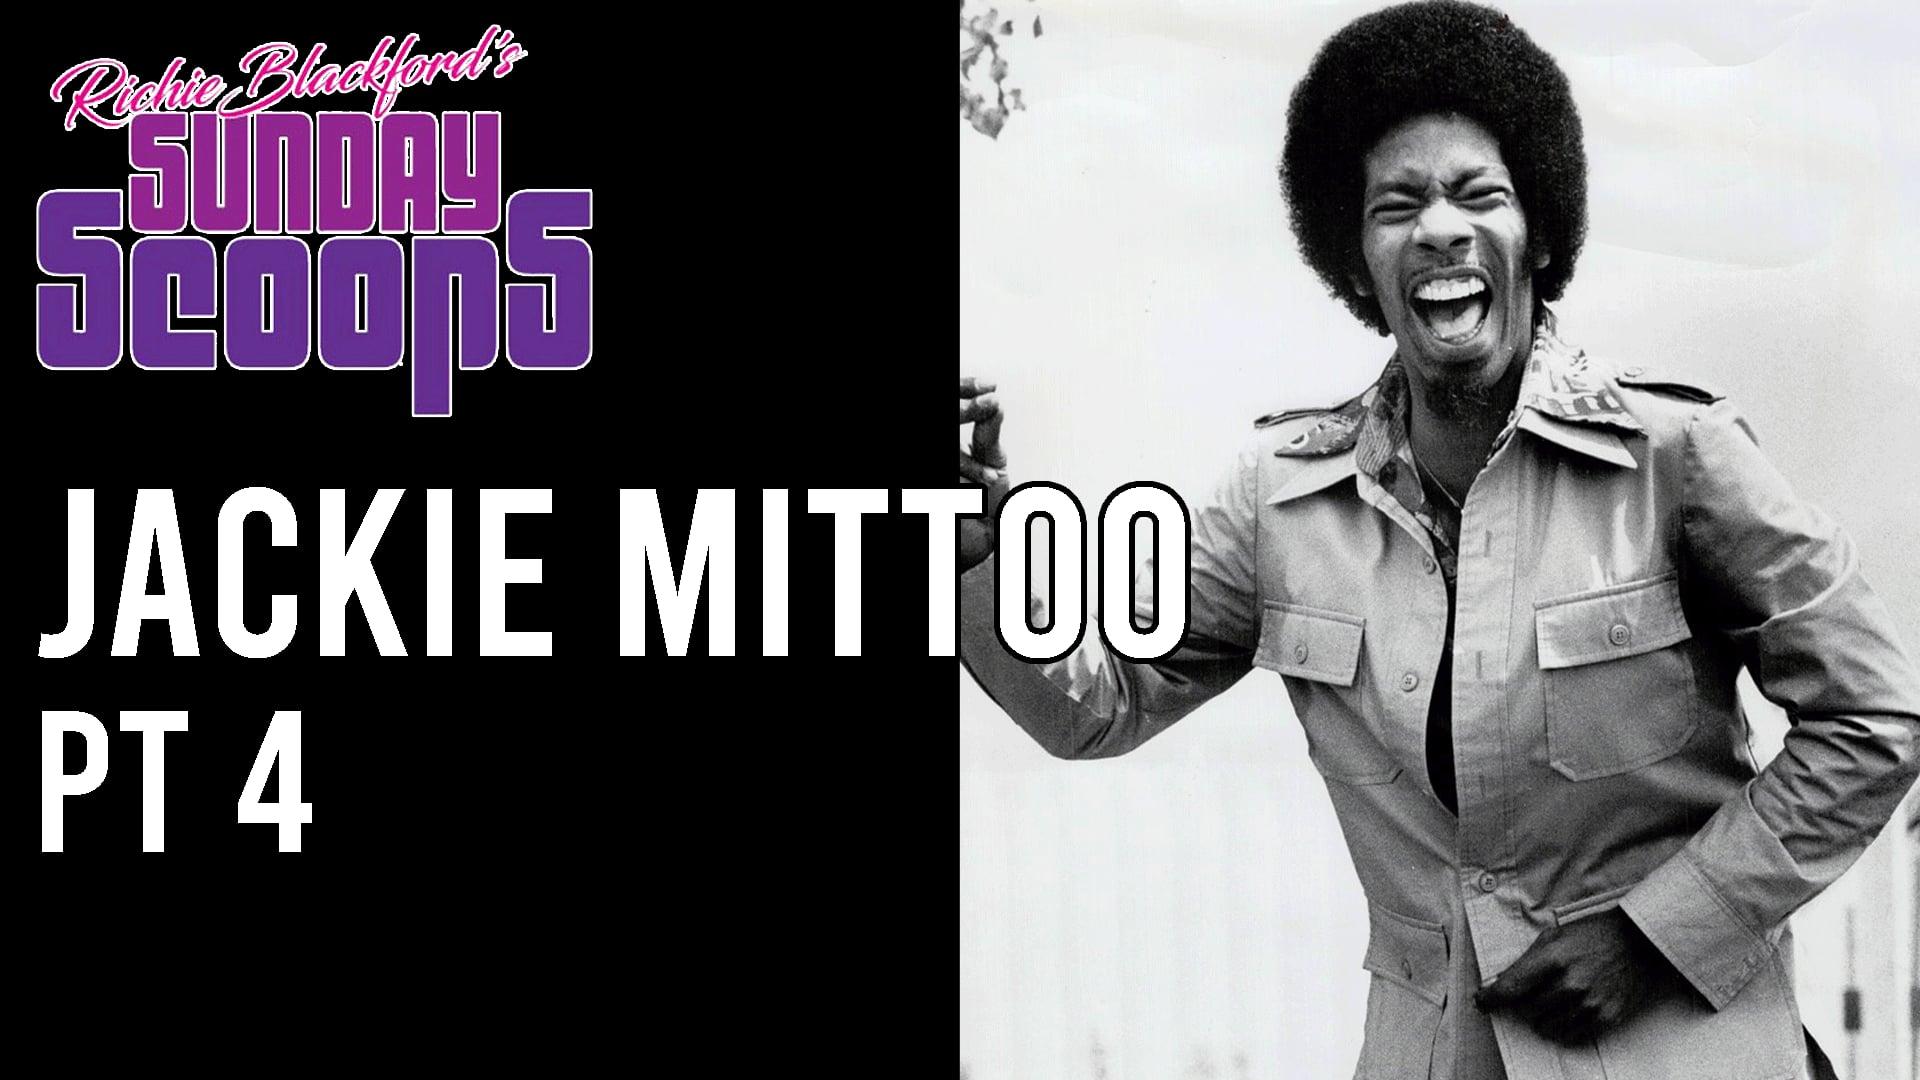 Sunday Scoops - Jackie Mittoo Pt 4